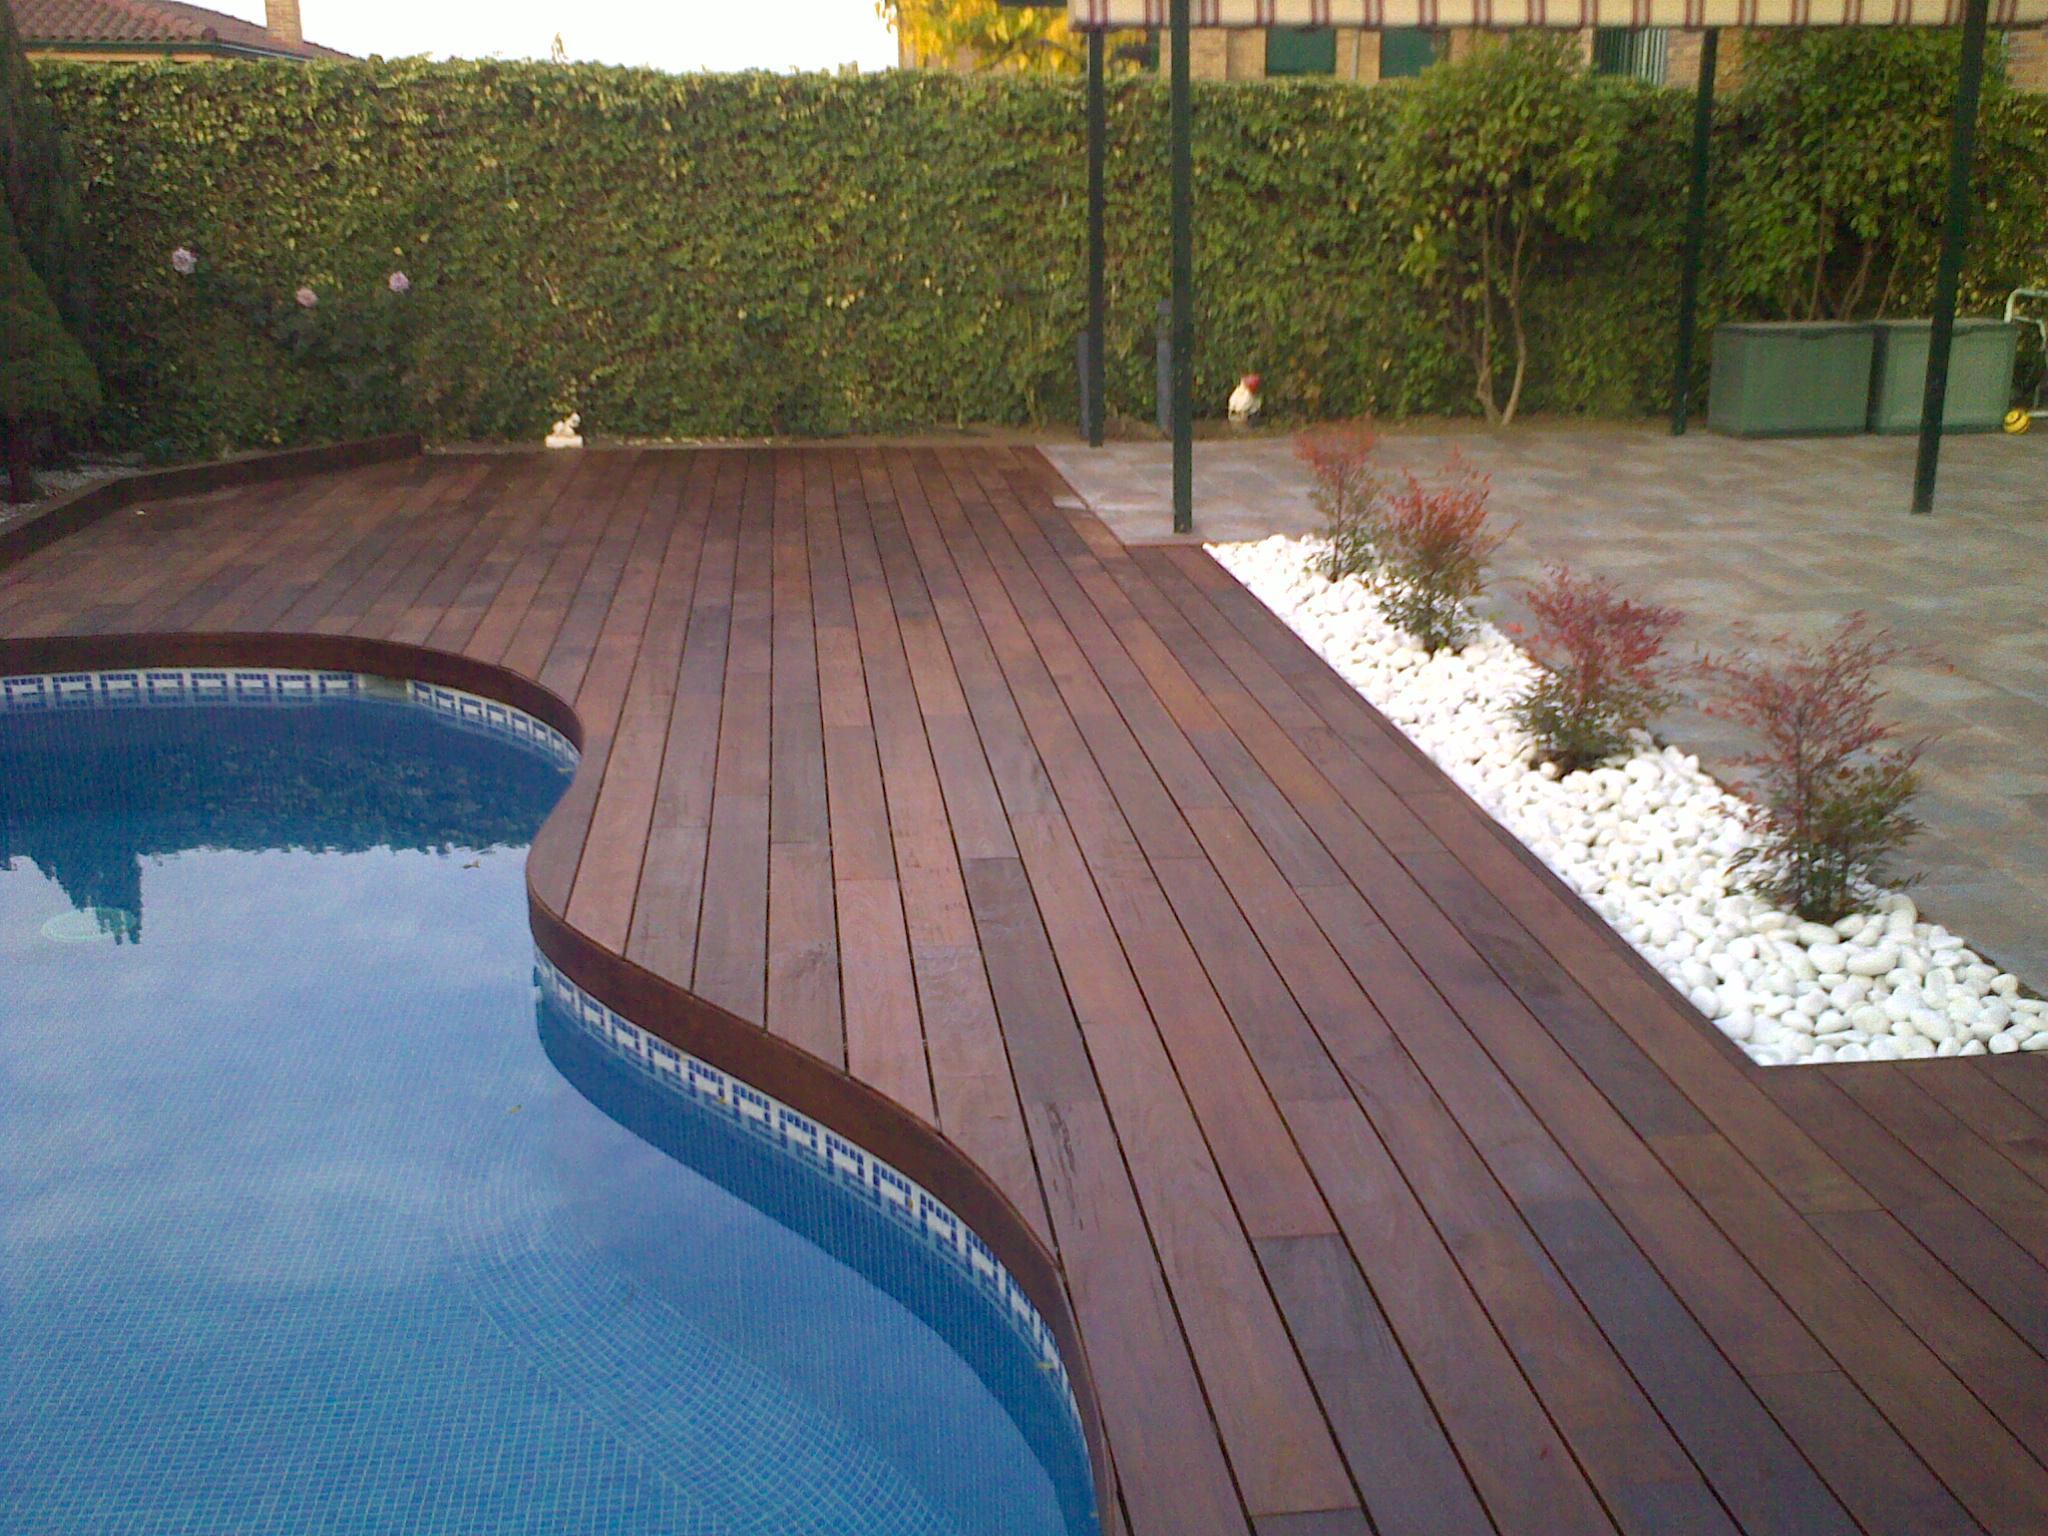 https://topmadera.com/wp-content/uploads/Instalacion-de-ipe-de-exterior-en-piscina-en-Arroyomolinos.jpg